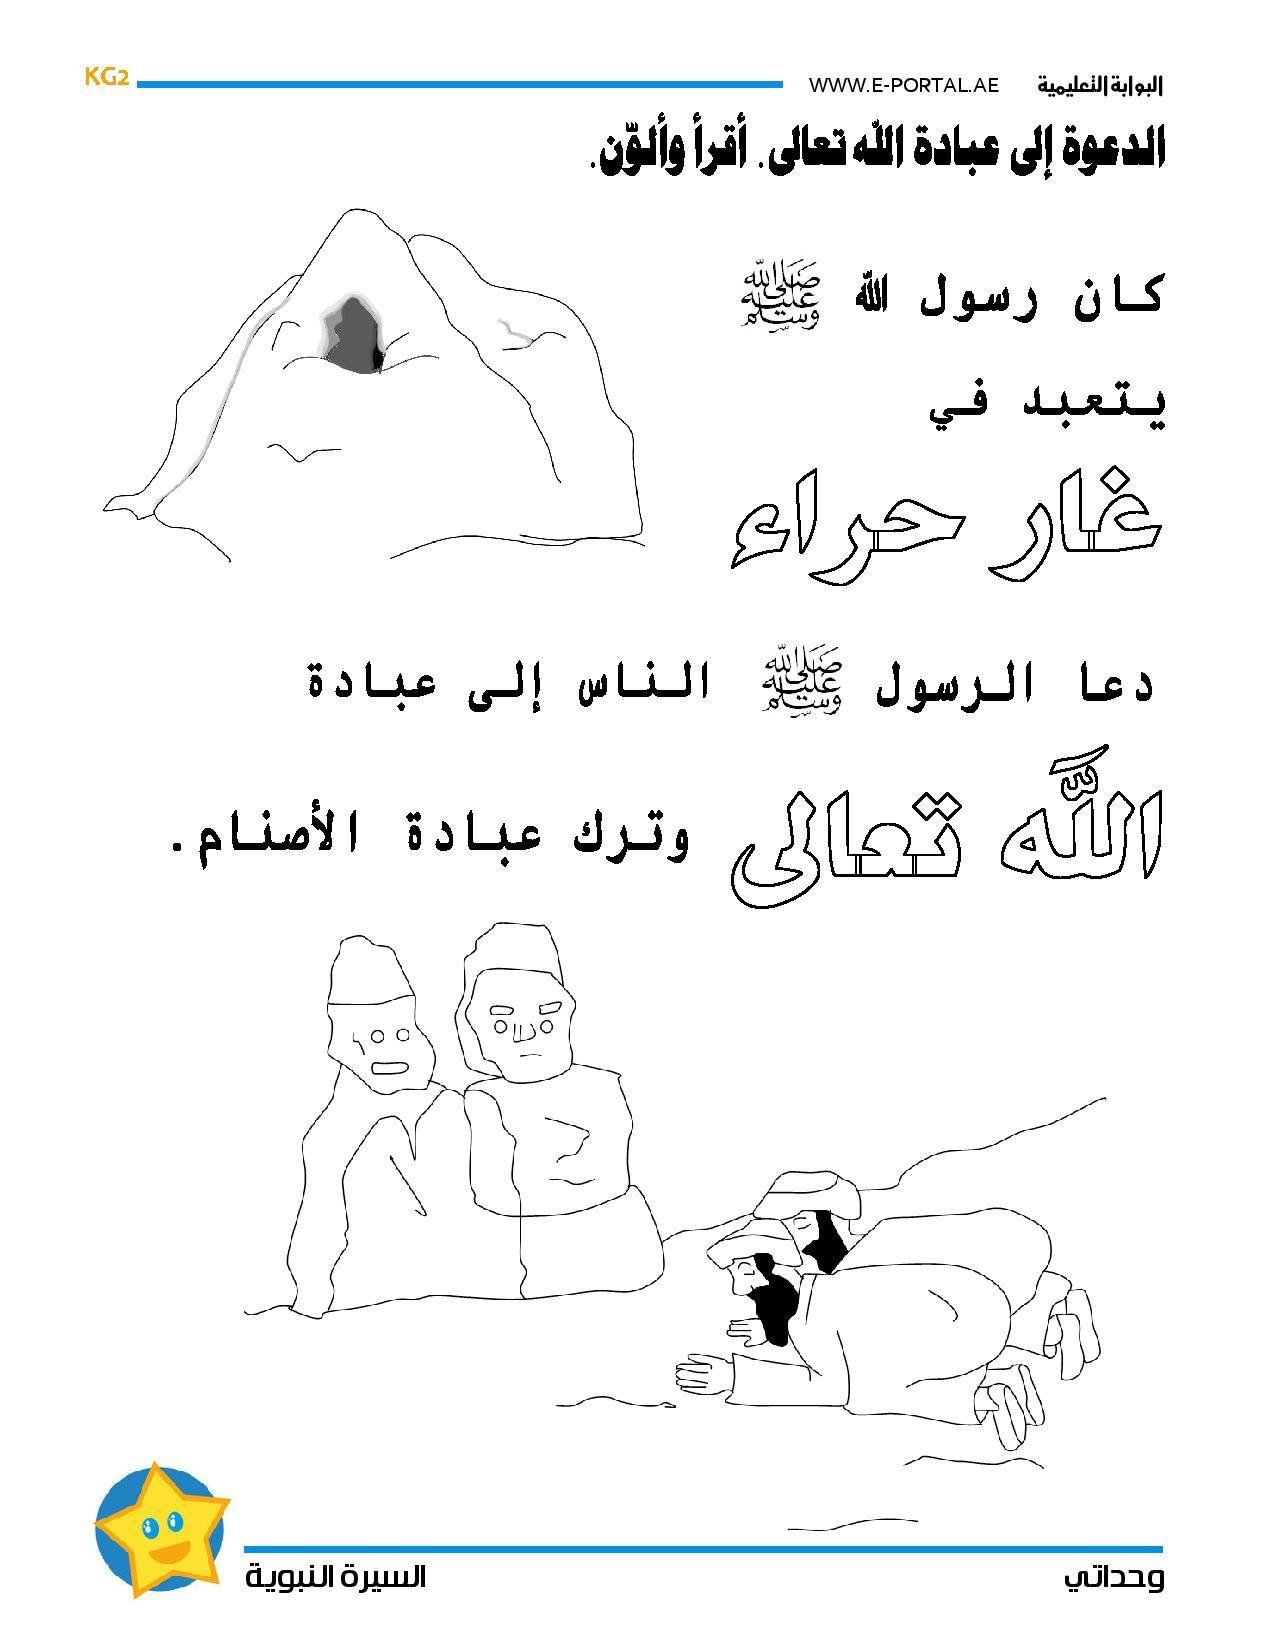 Pin By Fatmeh Amro On Ecole Islamic Kids Activities Arabic Kids Islam For Kids